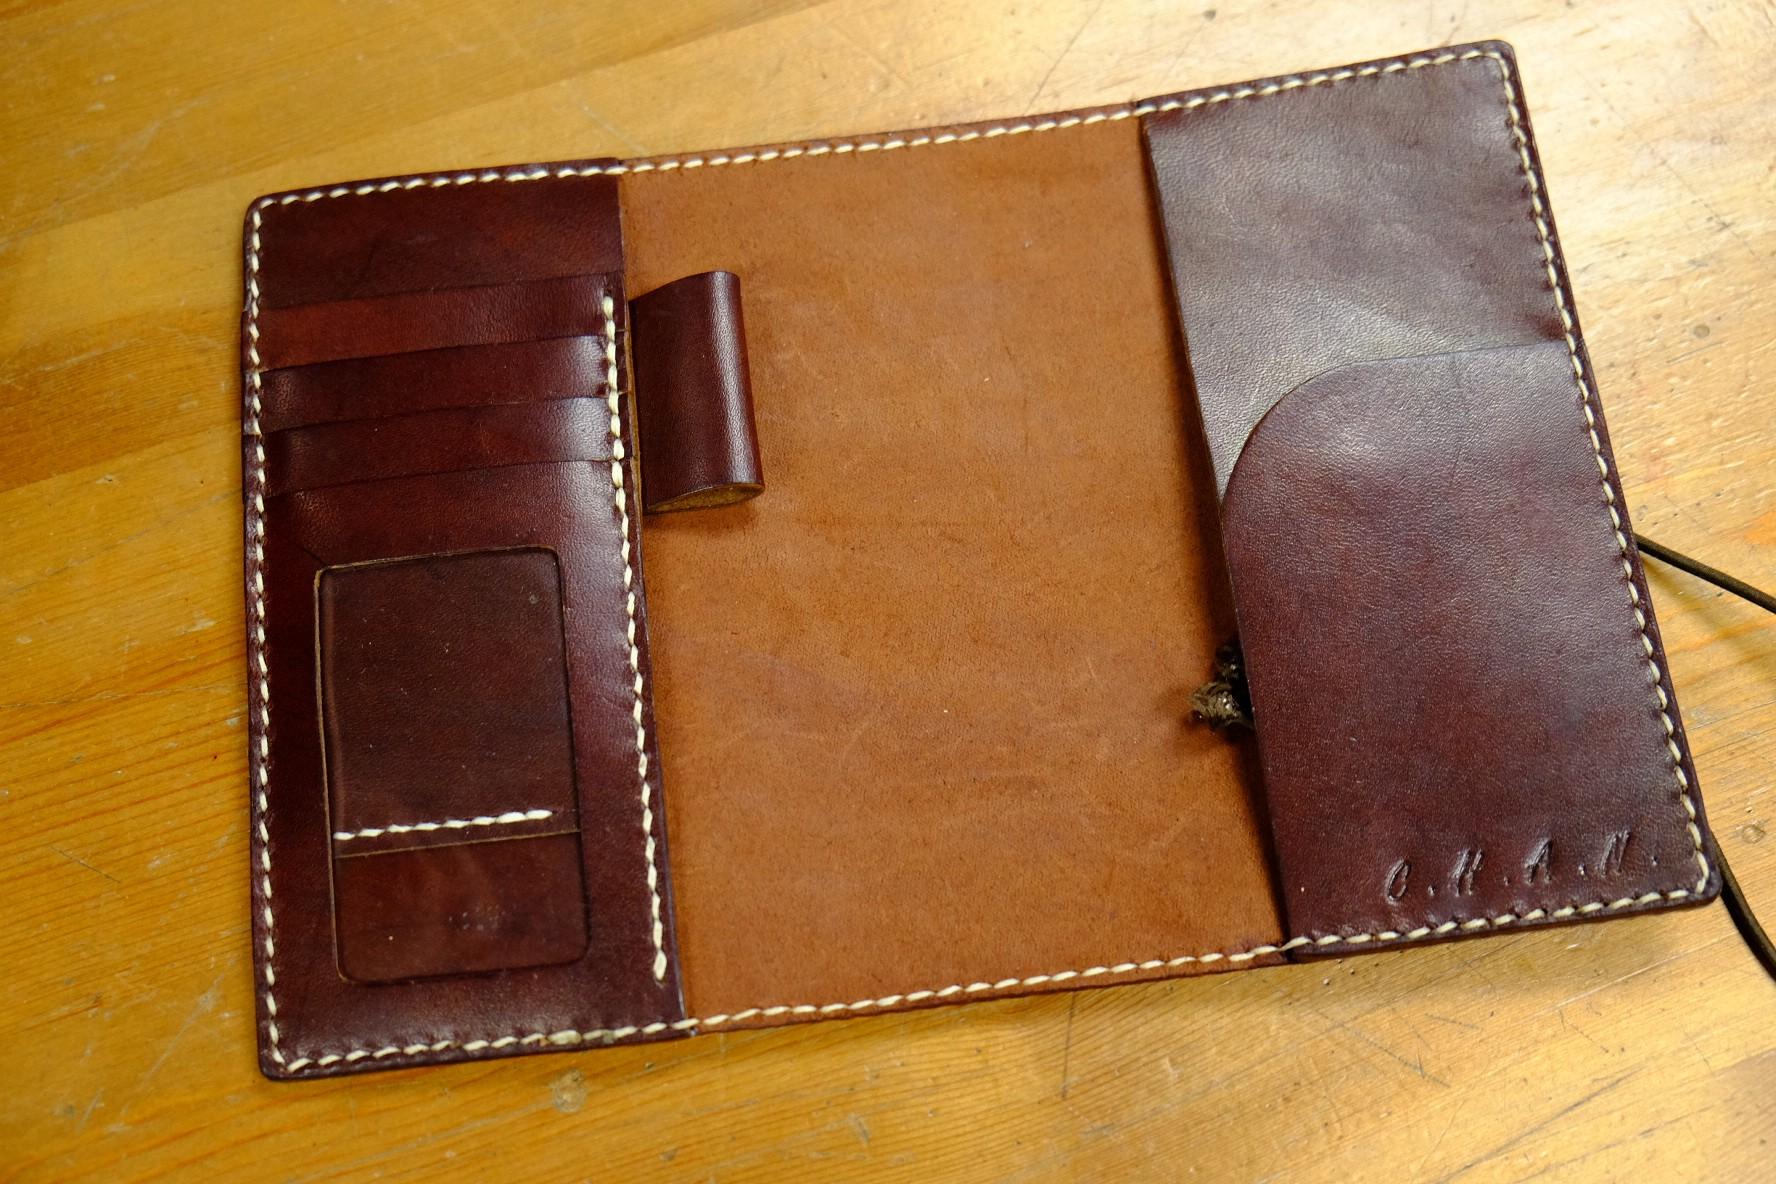 Leather Book Cover Diy : Motto carpe diem-handmade leather workshop 皮革課程 semi